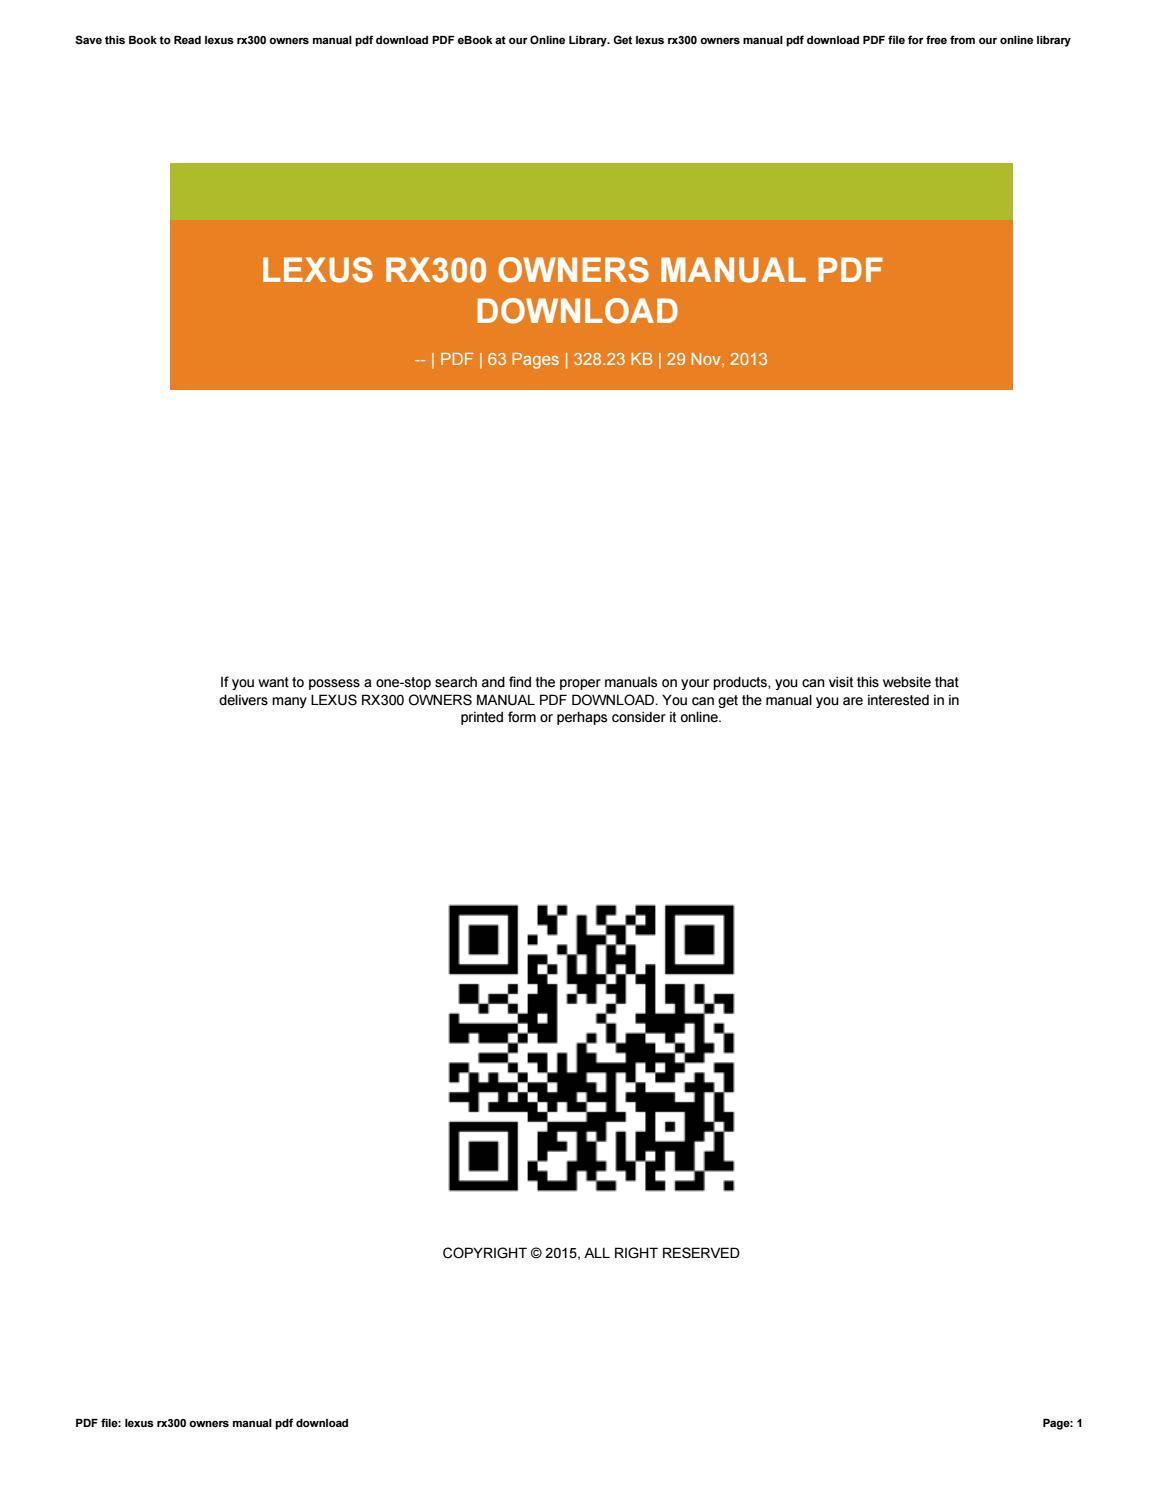 owners manual for lexus rx300 browse manual guides u2022 rh trufflefries co Lexus RX300 Repair Manual Lexus RX300 Owners Manual PDF